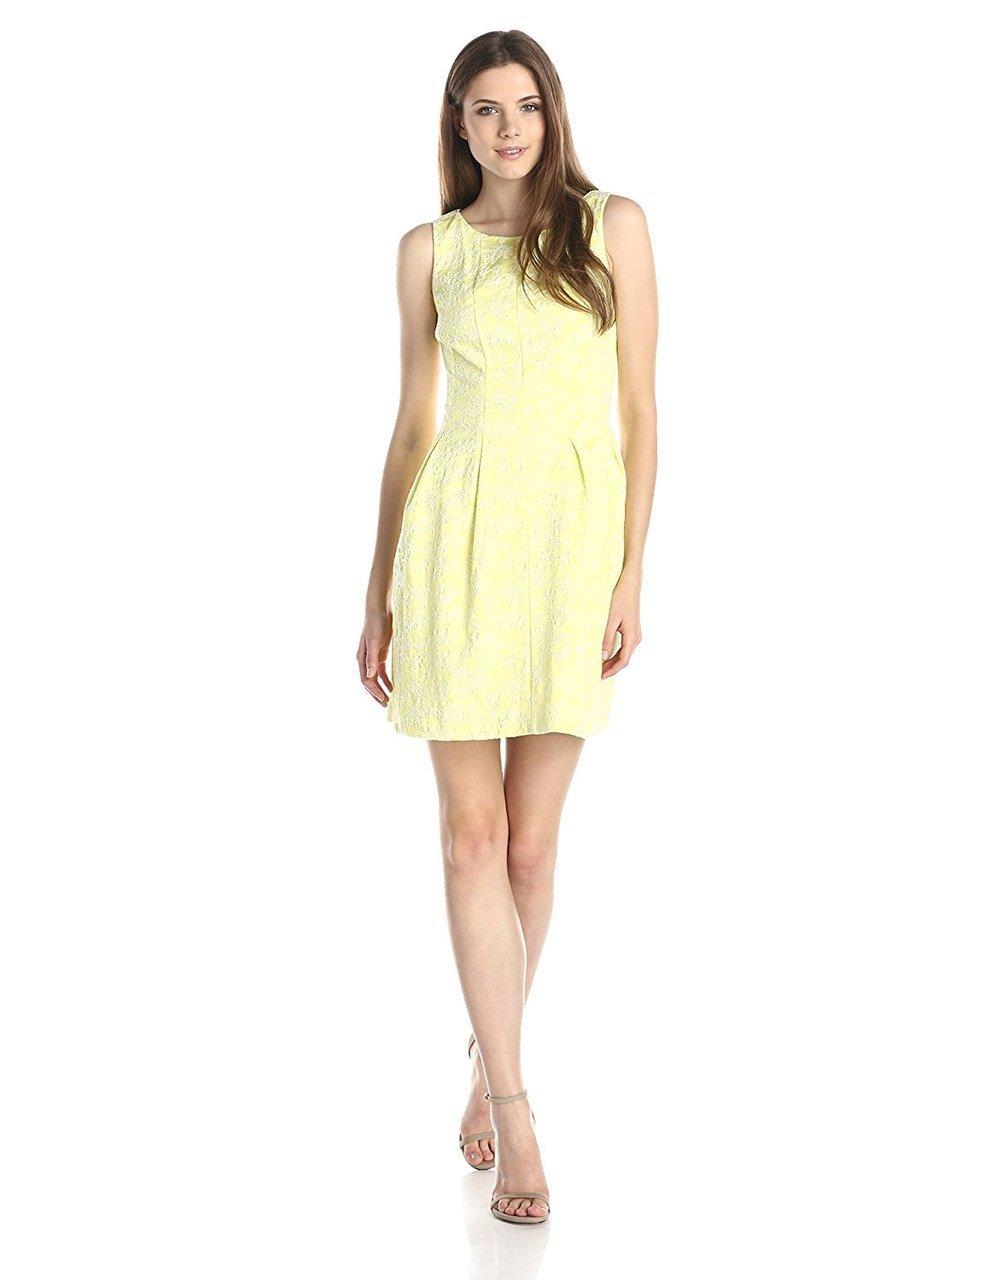 Taylor - Sleeveless Floral Scoop Neck Dress 5453M